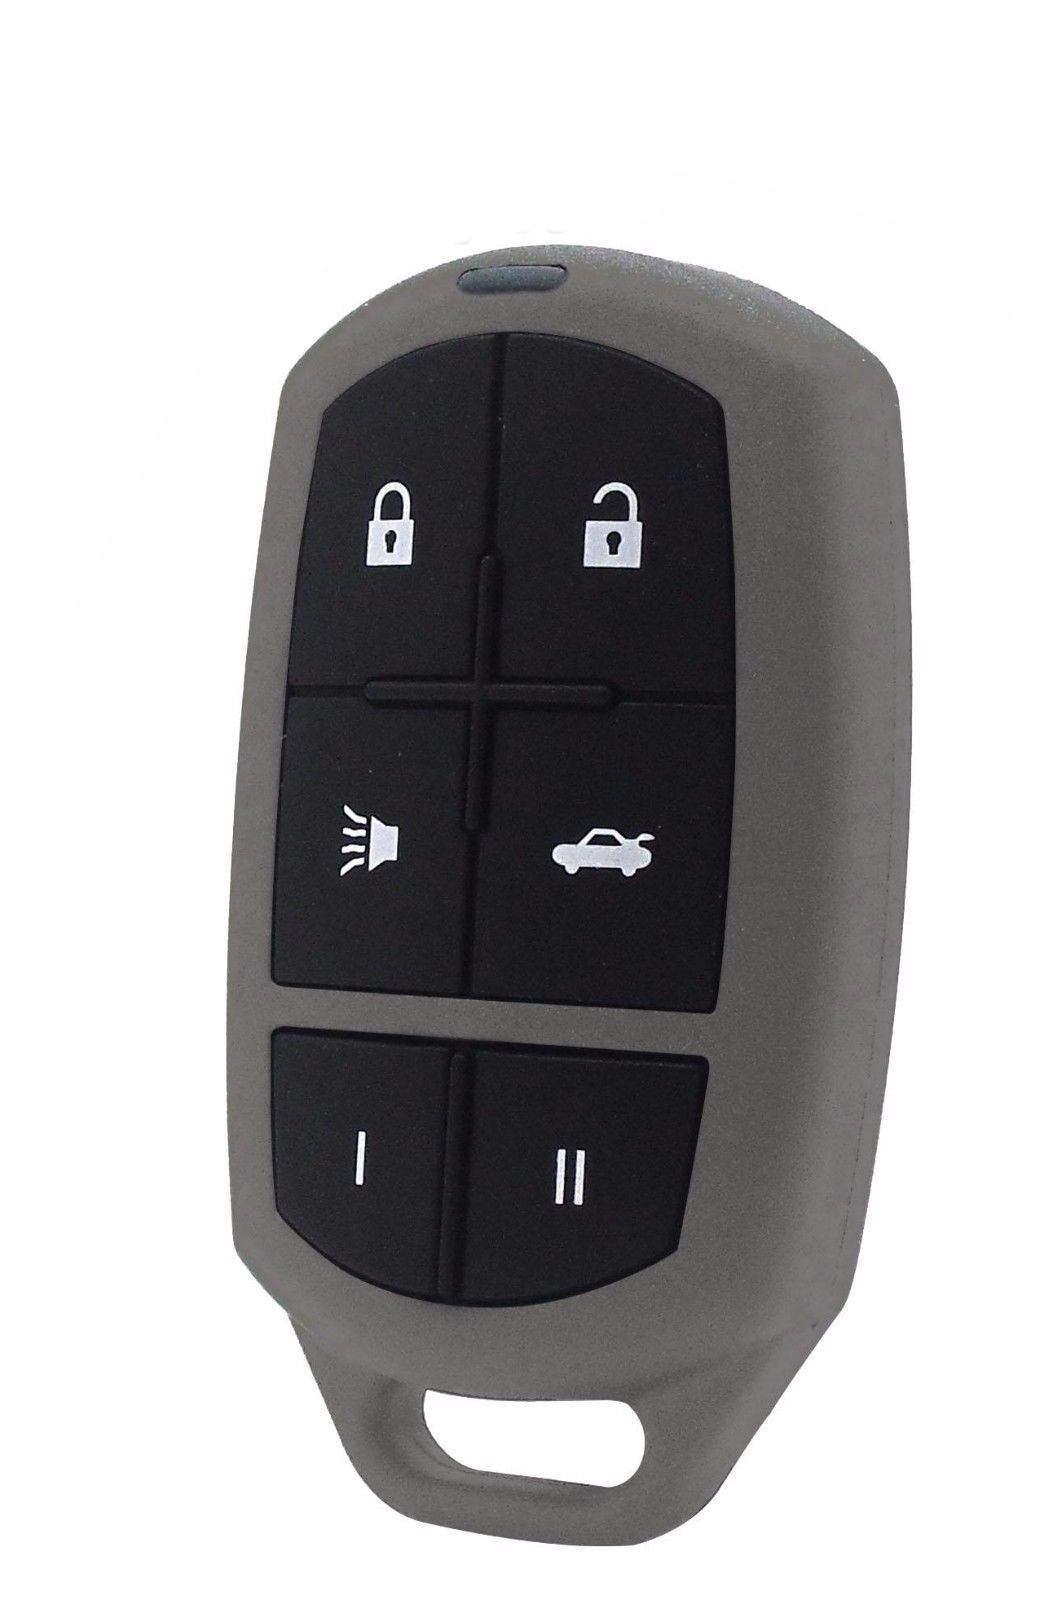 iKeyless Brand Remote Keyless Entry - 4 Button